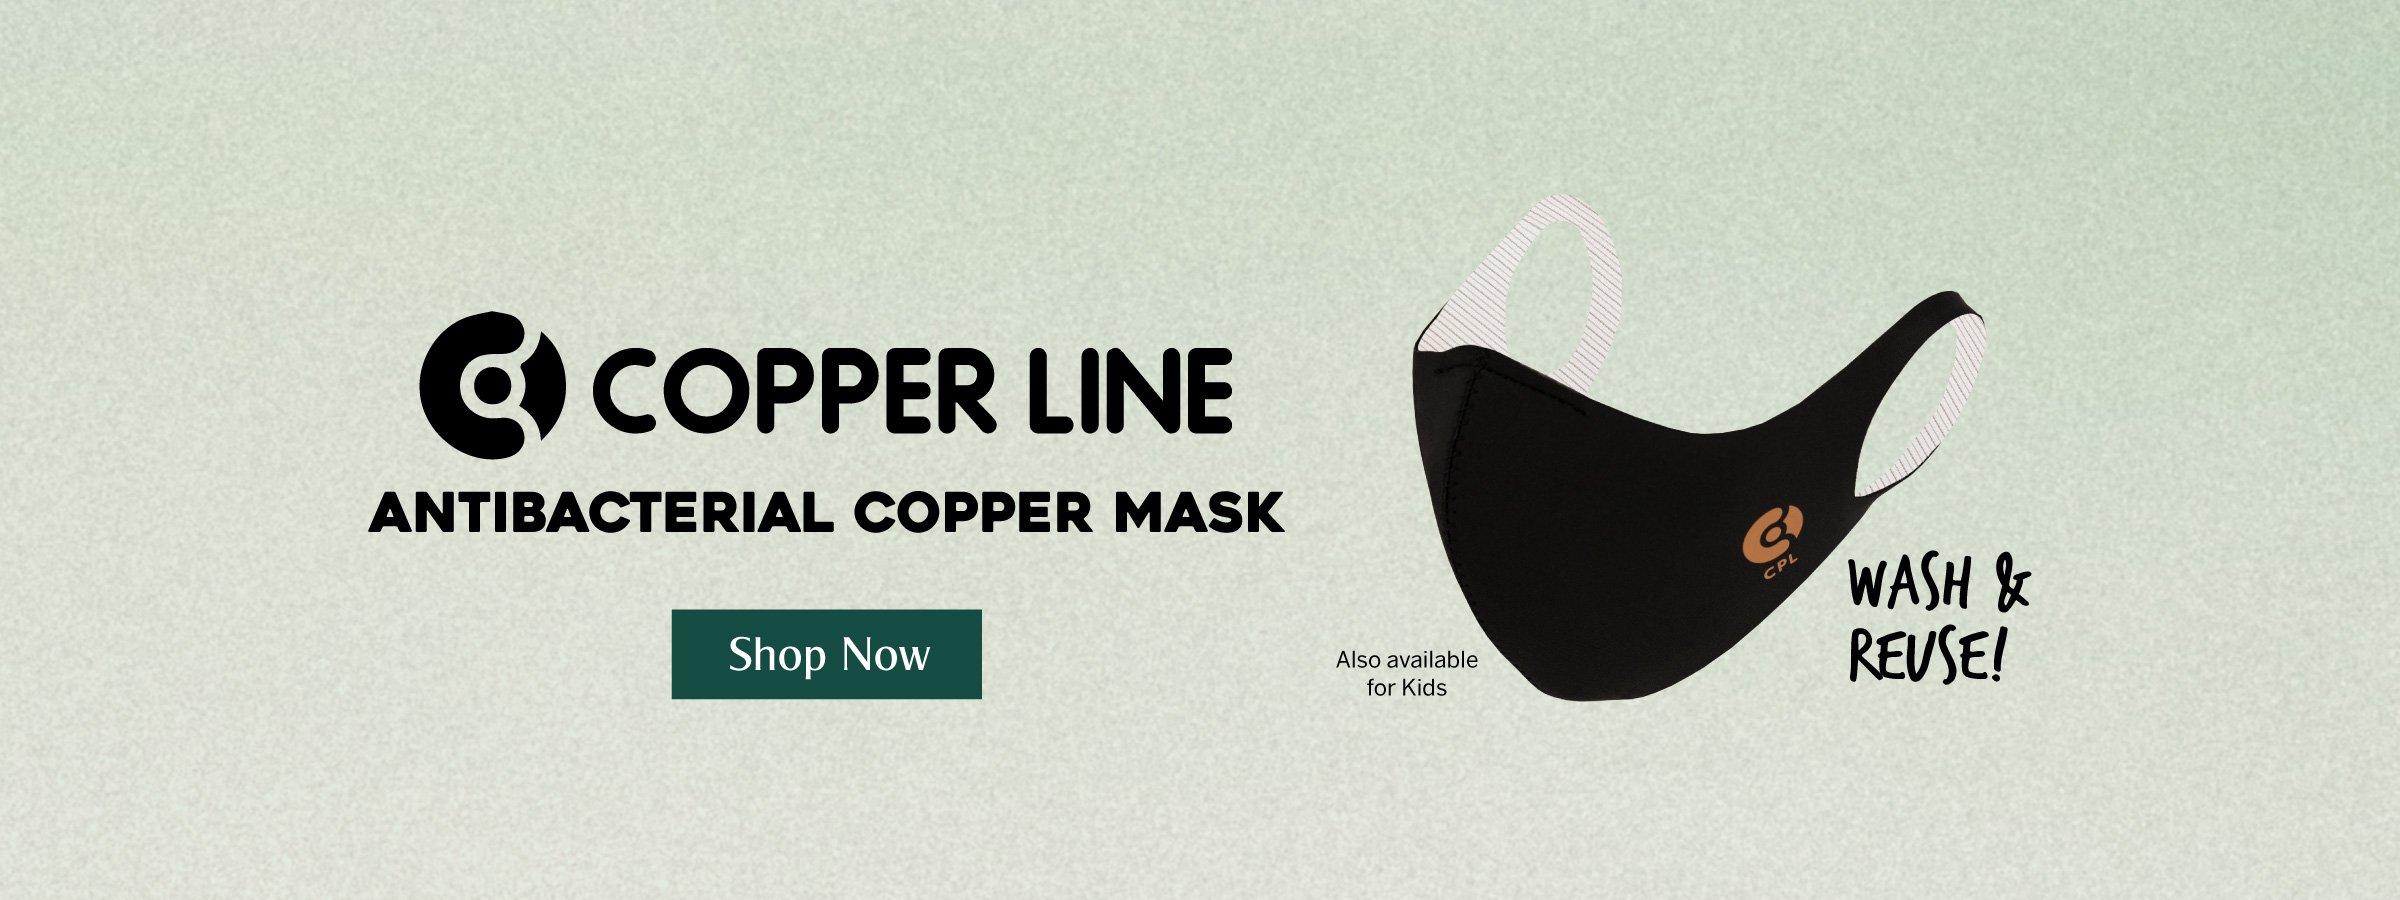 Copper Line Antibacterial Copper Mask